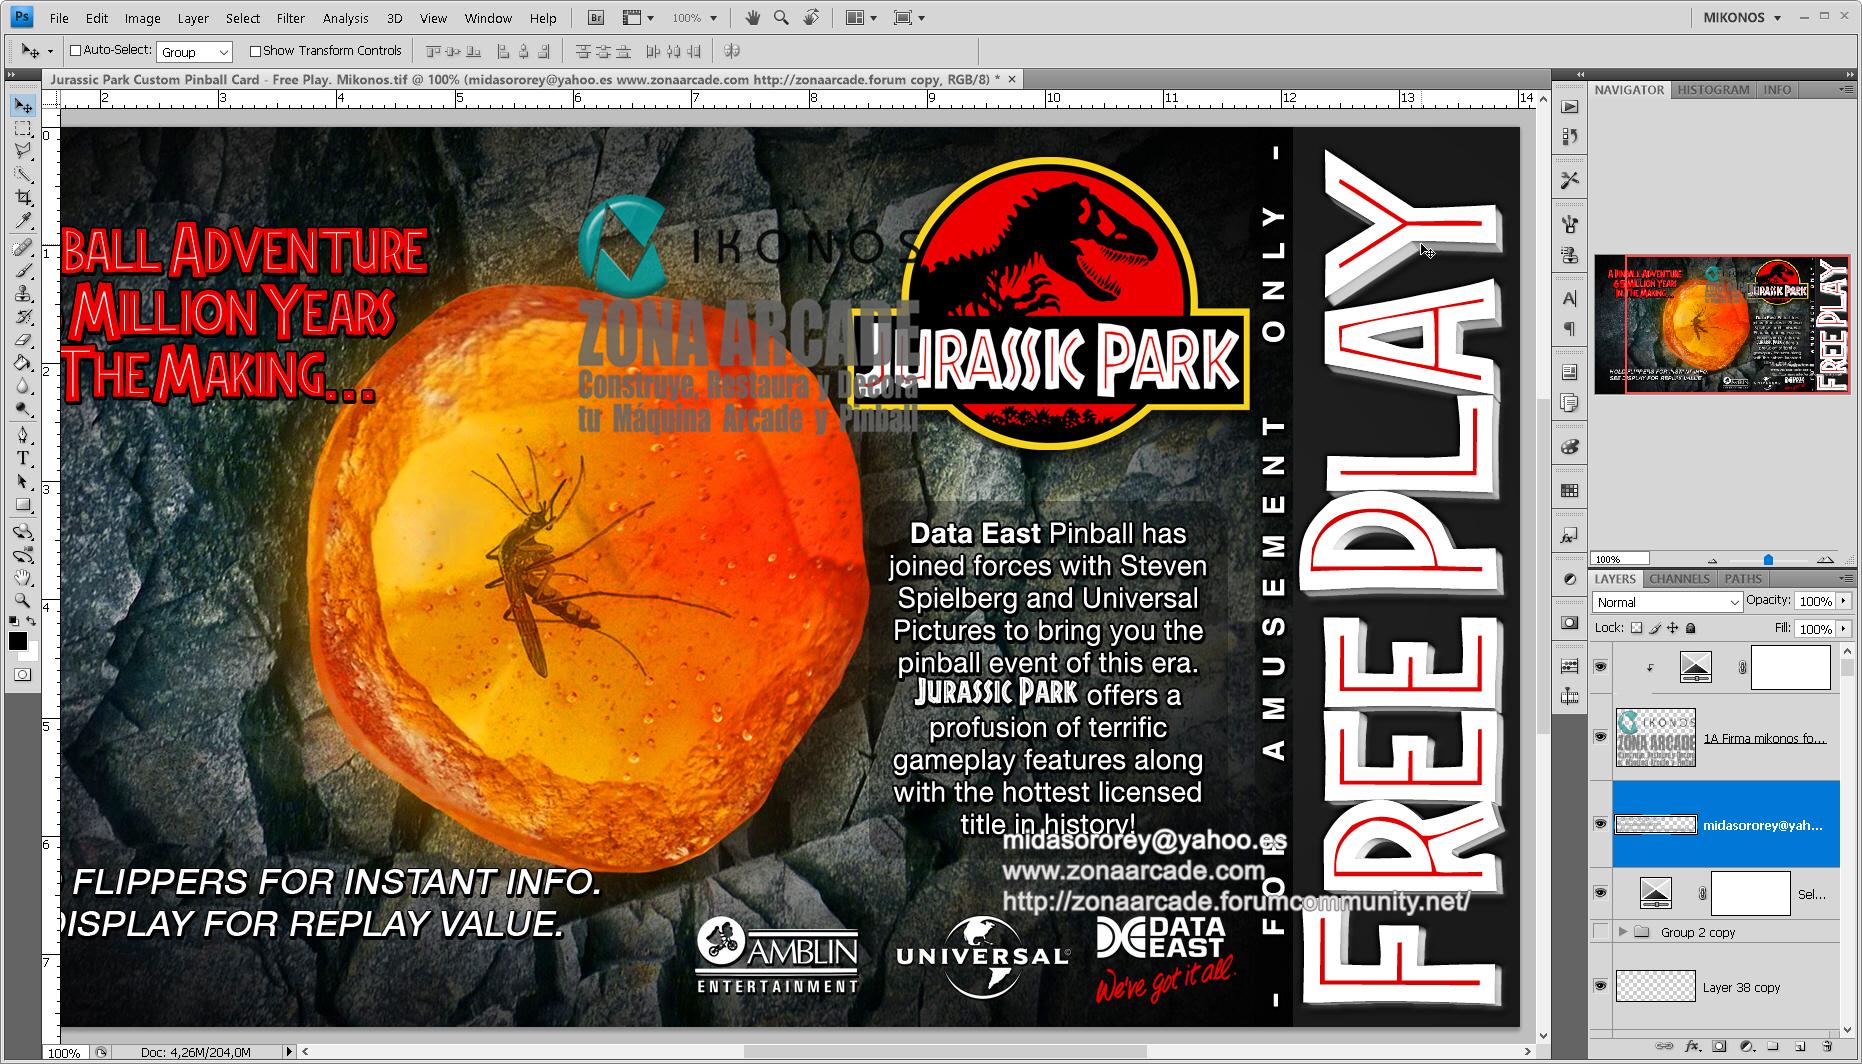 Jurassic%20Park%20Custom%20Pinball%20Card%20-%20Free%20Play.%20Mikonos2.jpg